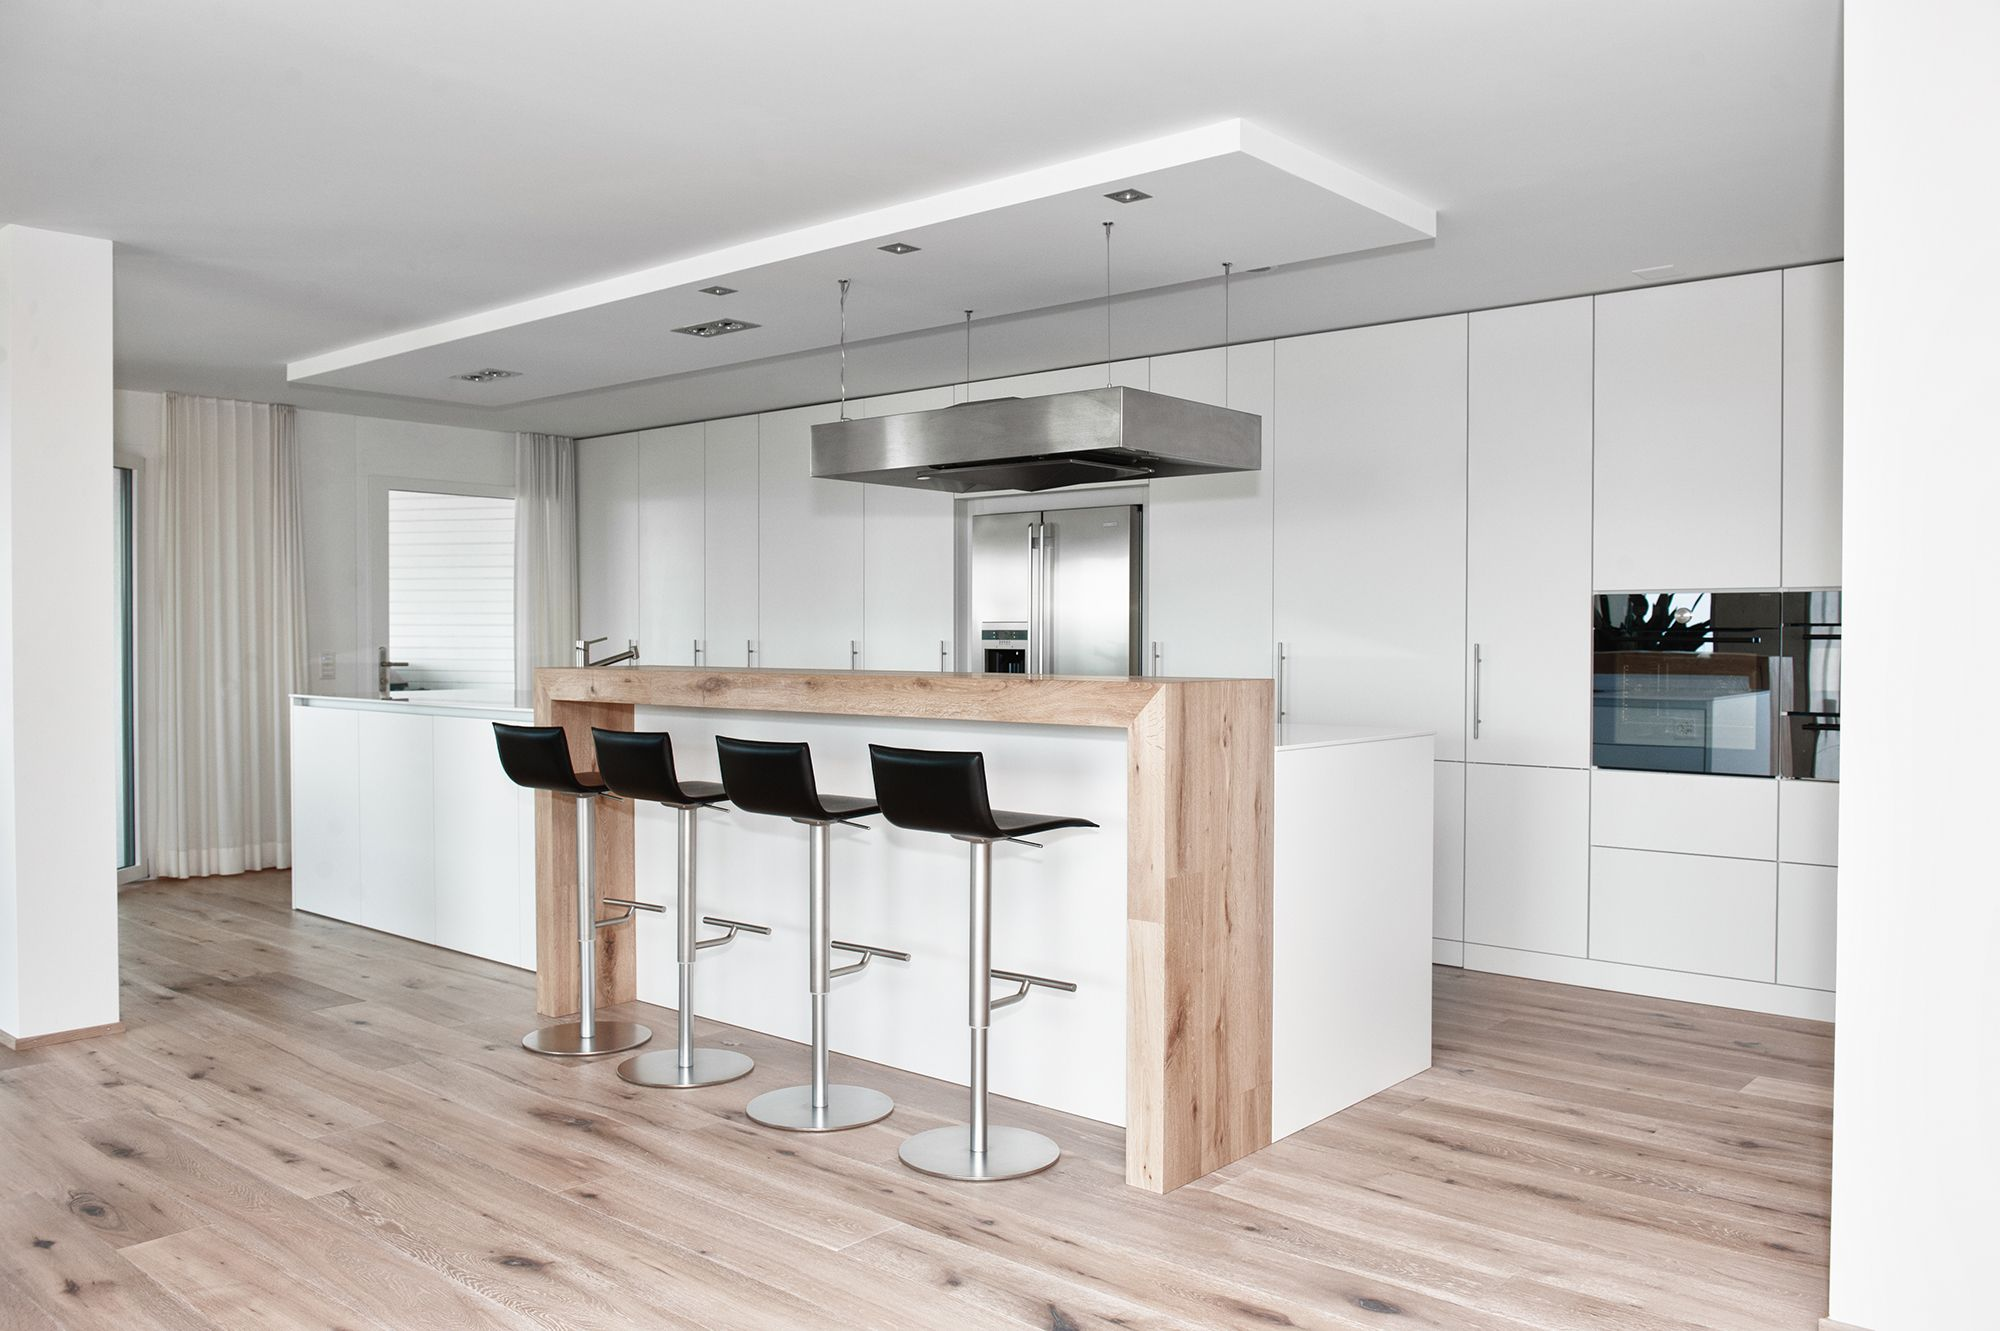 Hervorragend Moderne Küche Kochinsel Weiß Matt Holz Theke Kappa Armony   Wohn